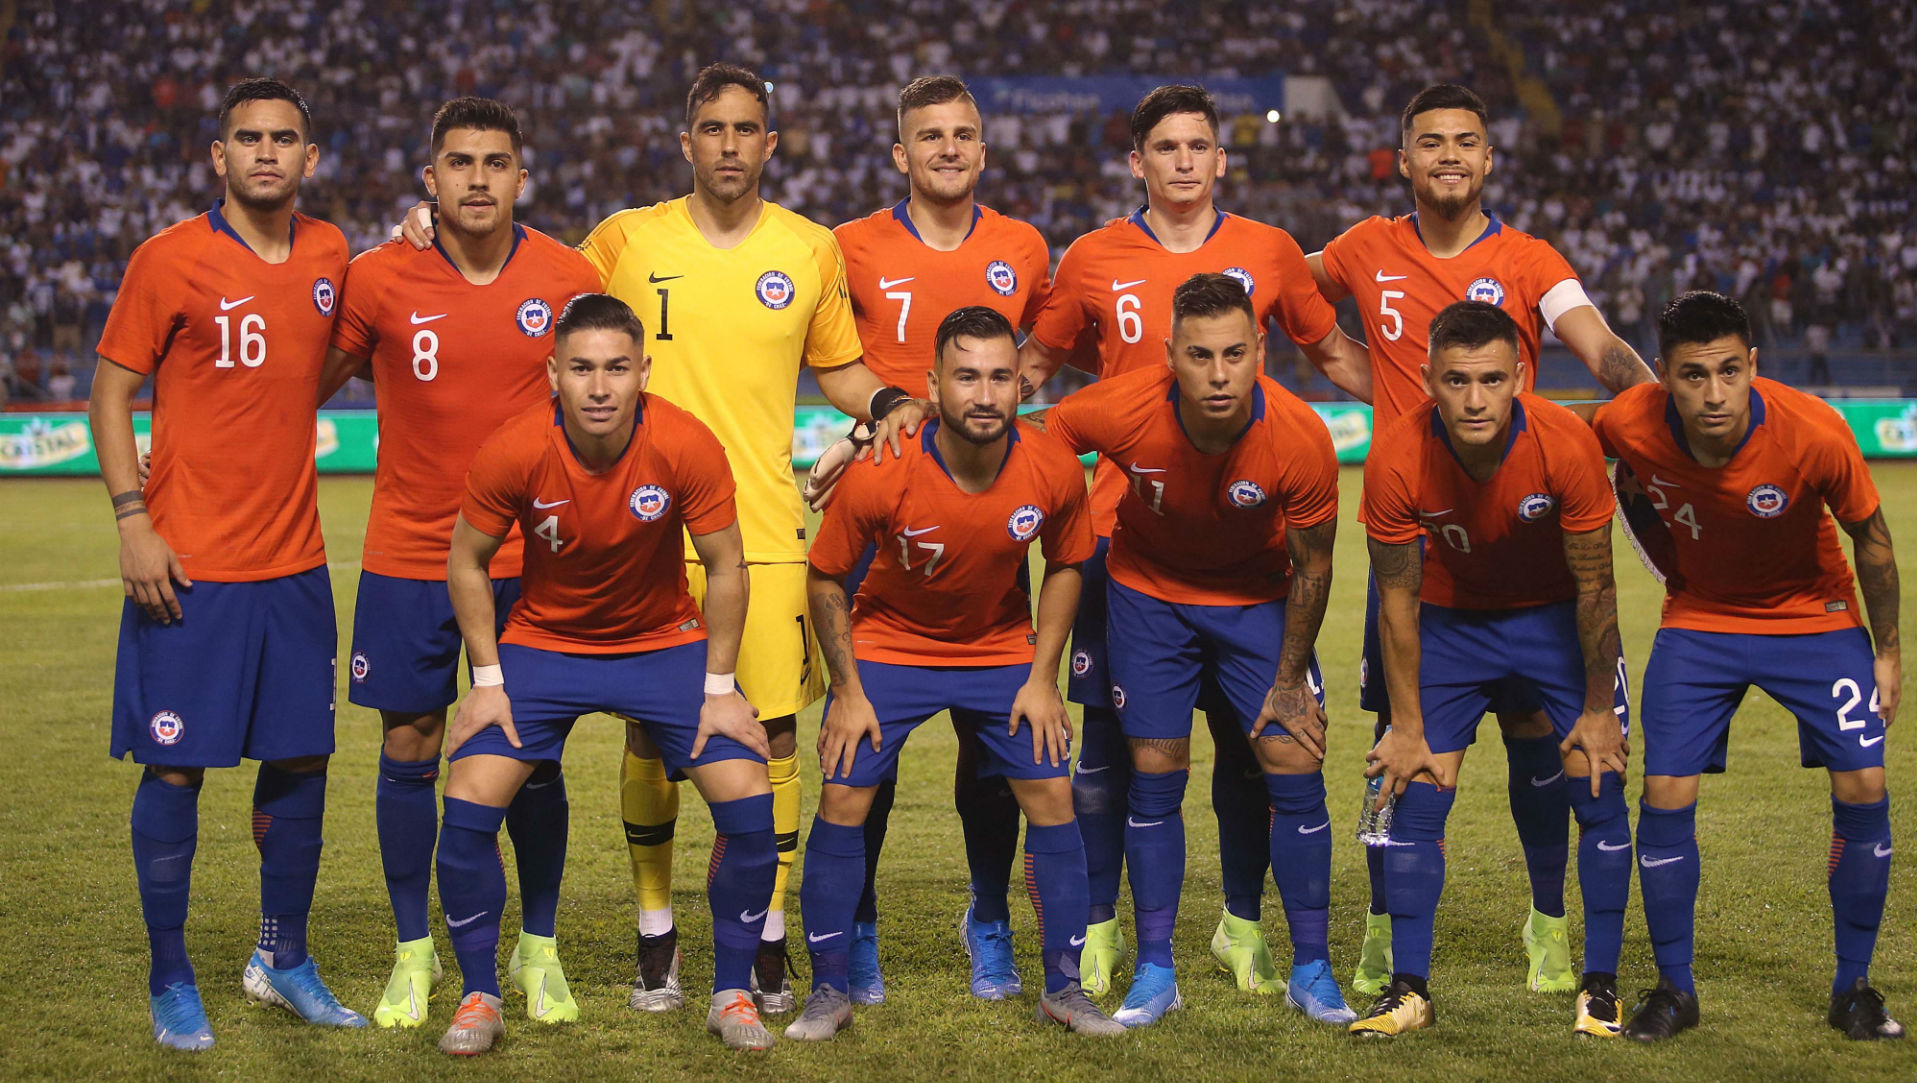 Resultado de imagen para chile honduras octubre 2019 goal